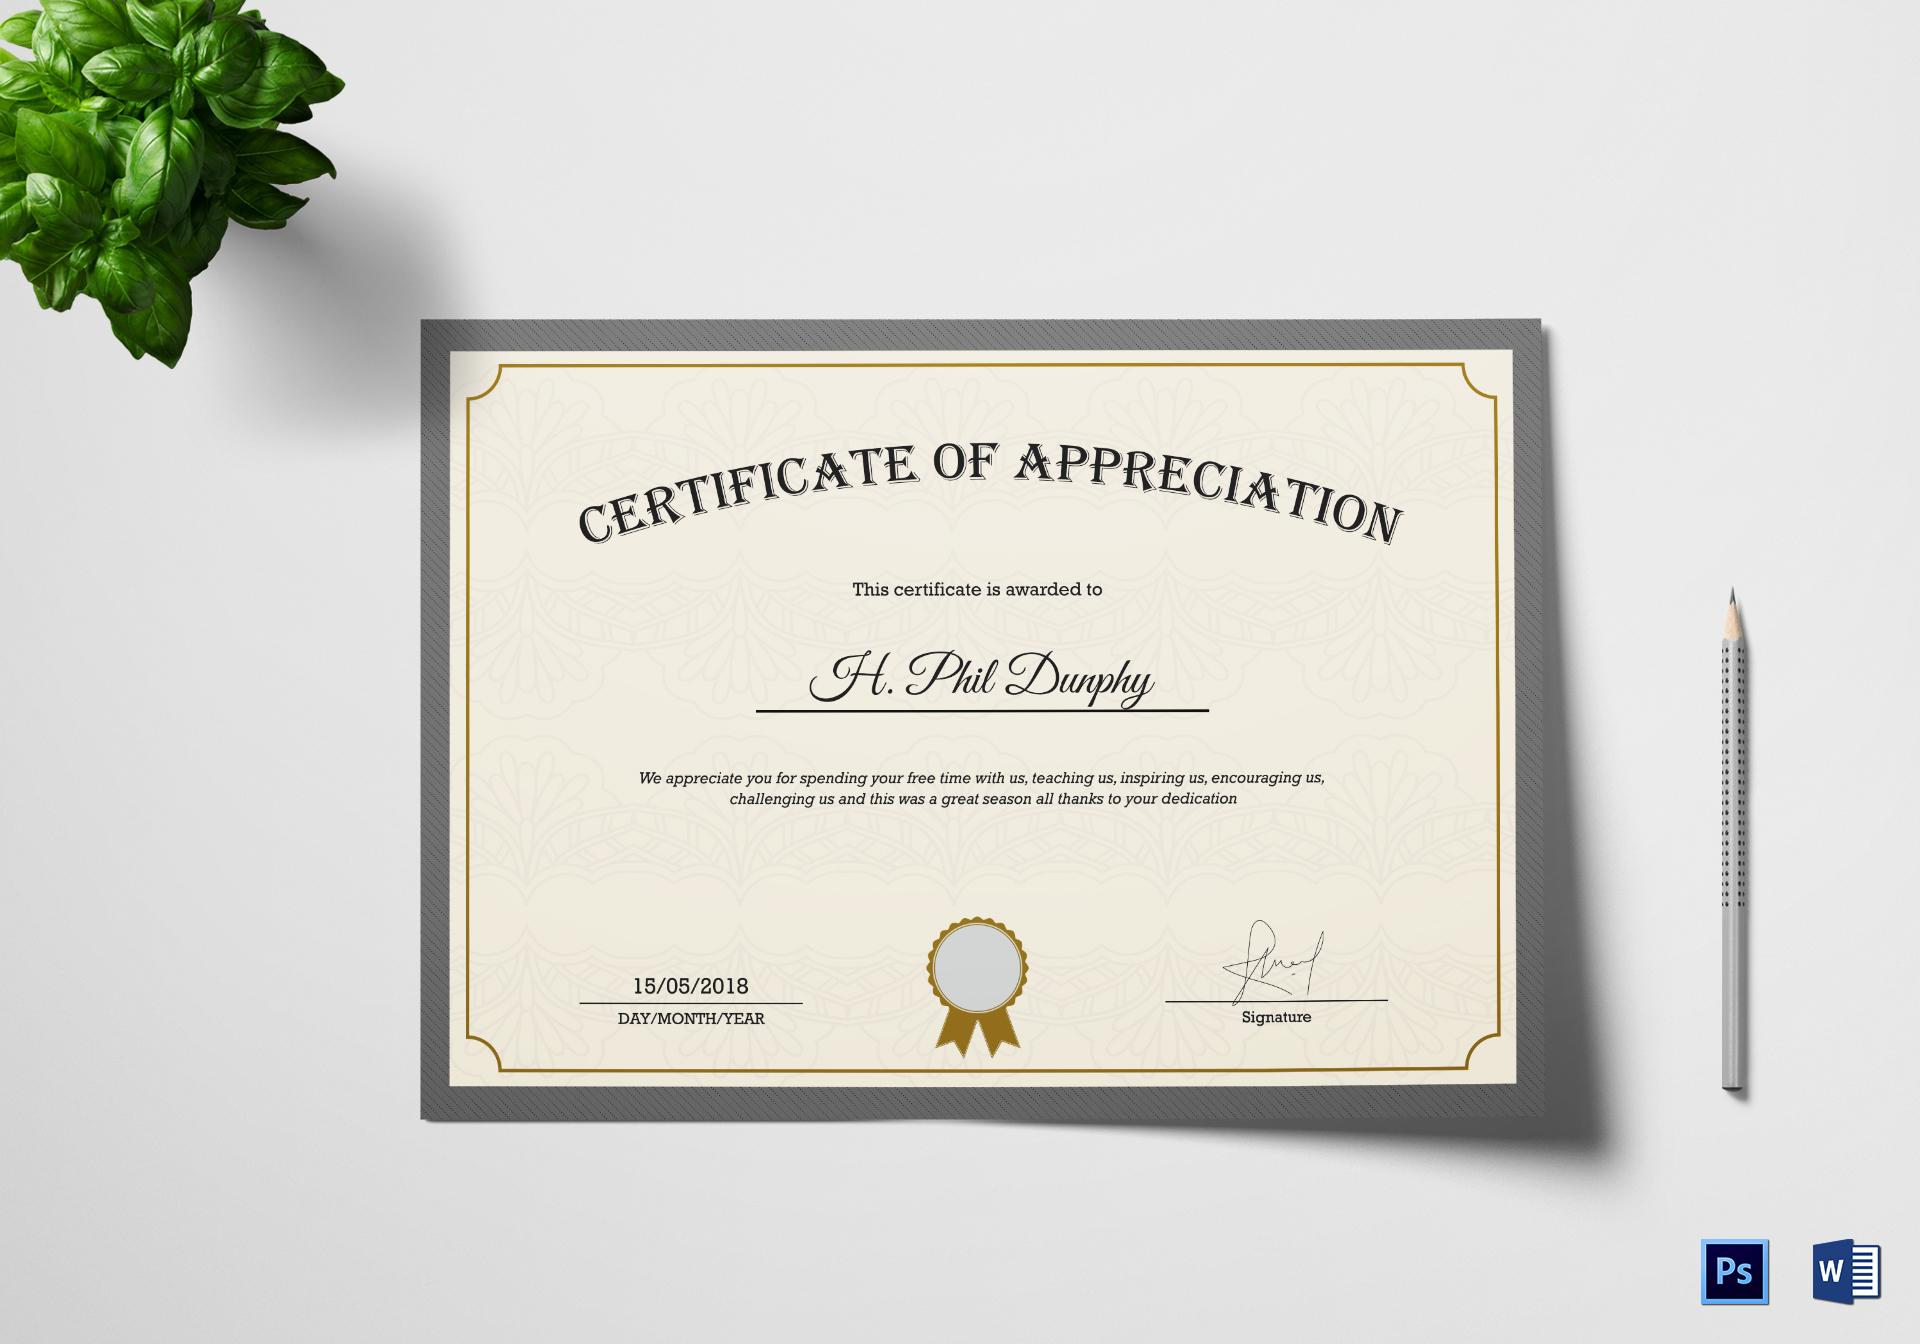 Company Appreciation Certificate Template